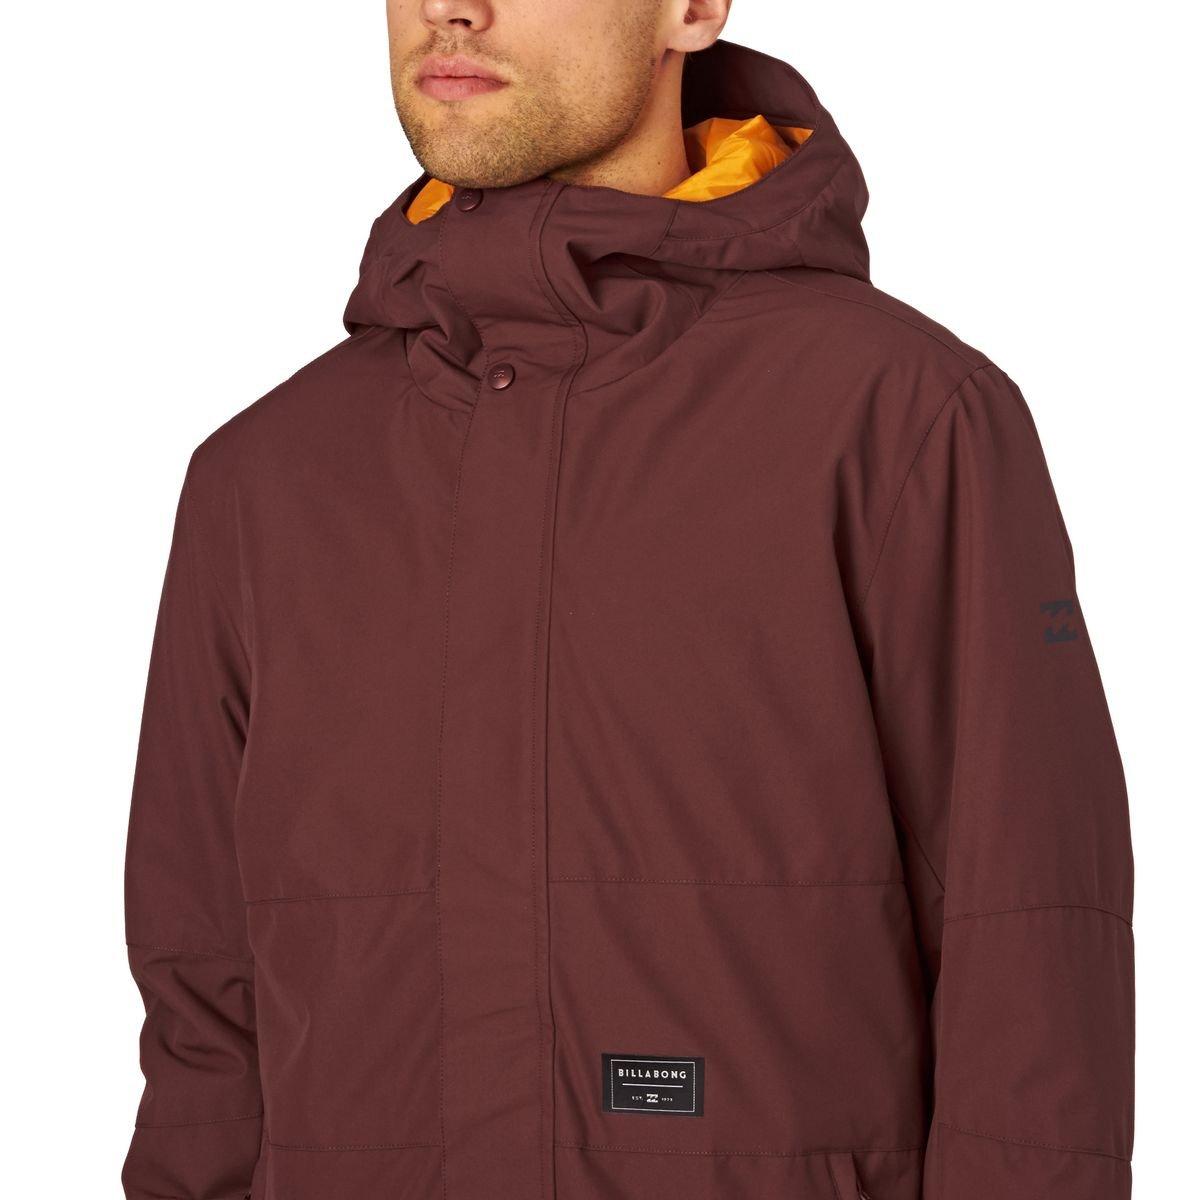 Hombre Billabong Legacy Plain Jacke Legacy Plain Jacket Chaqueta de esqu/í